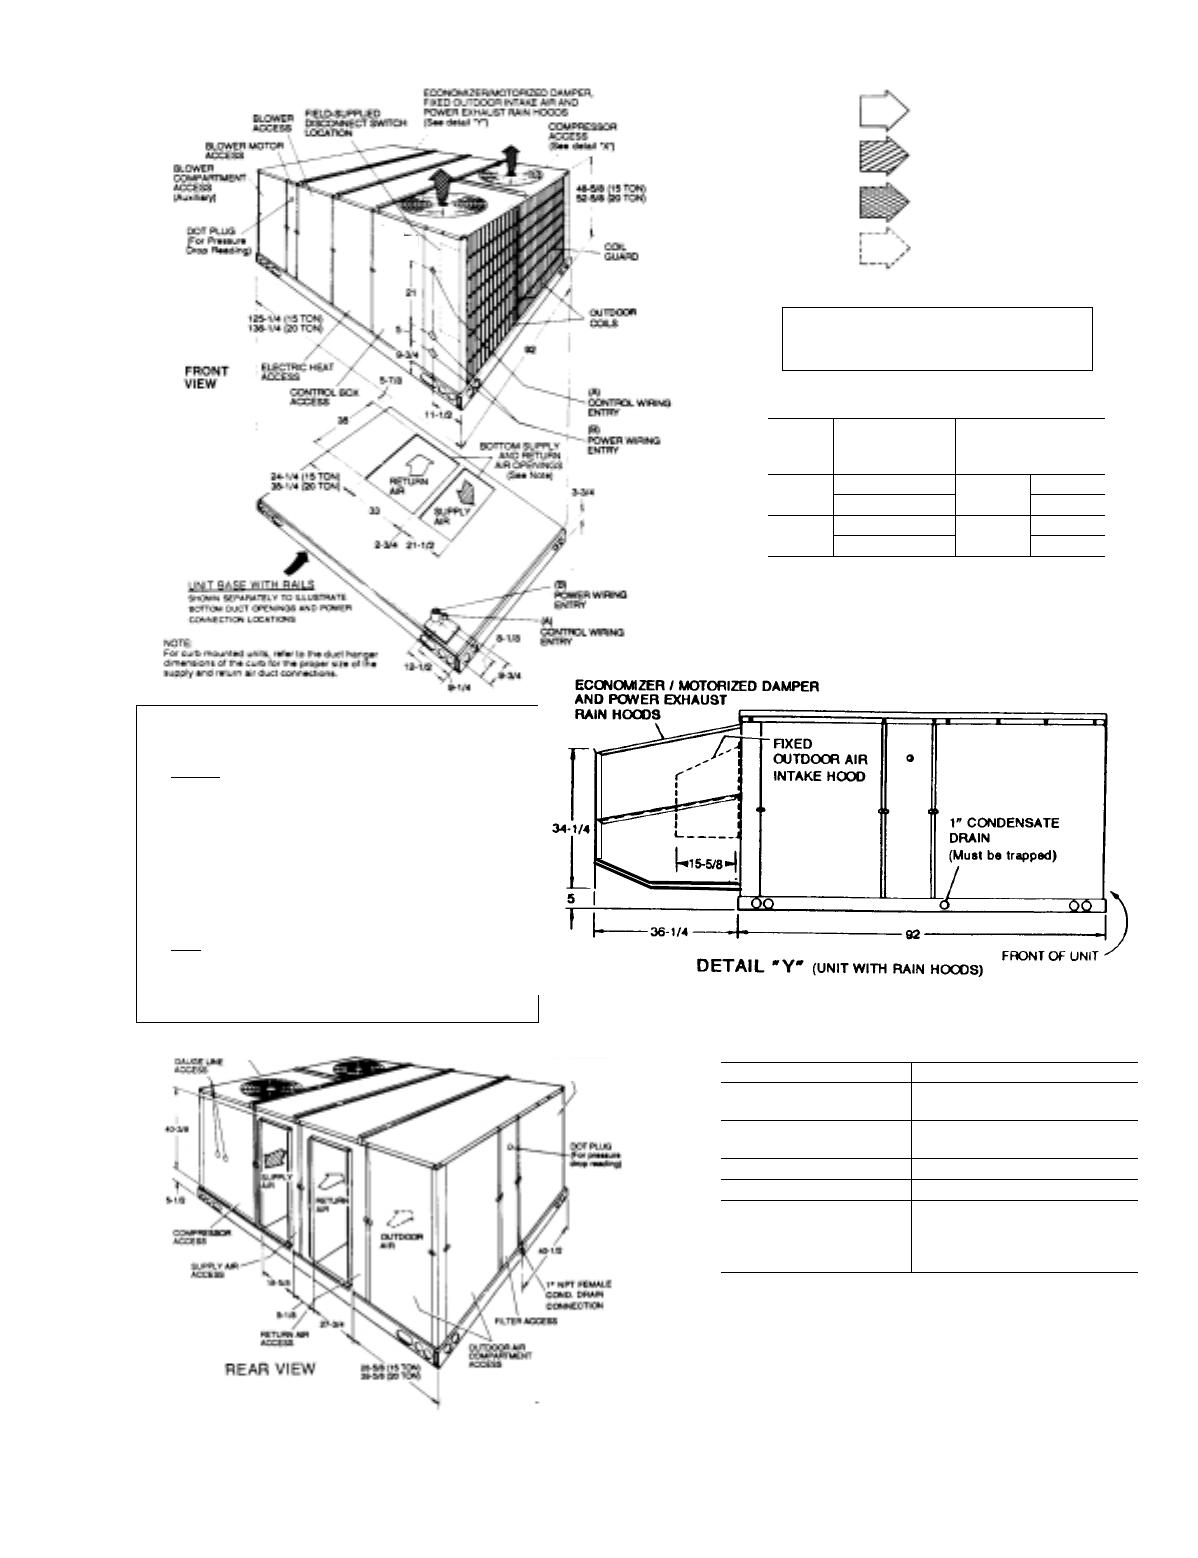 honeywell chronotherm 111 wiring t8611